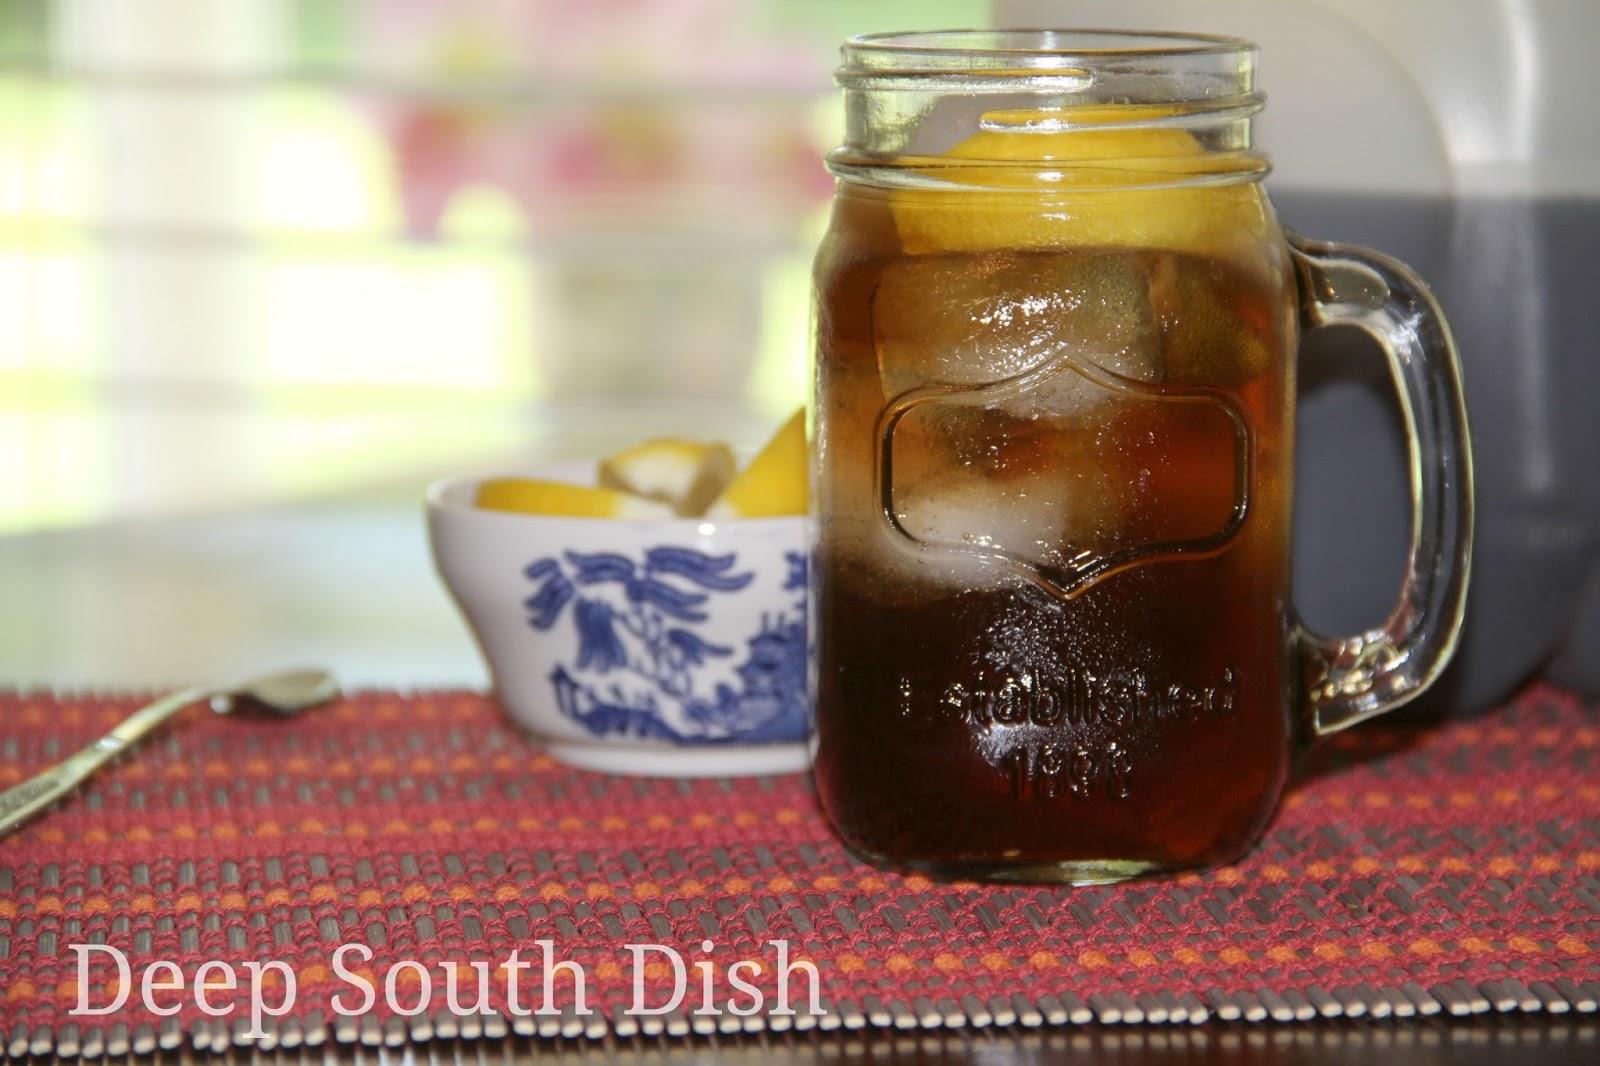 lipton diet green tea good or bad